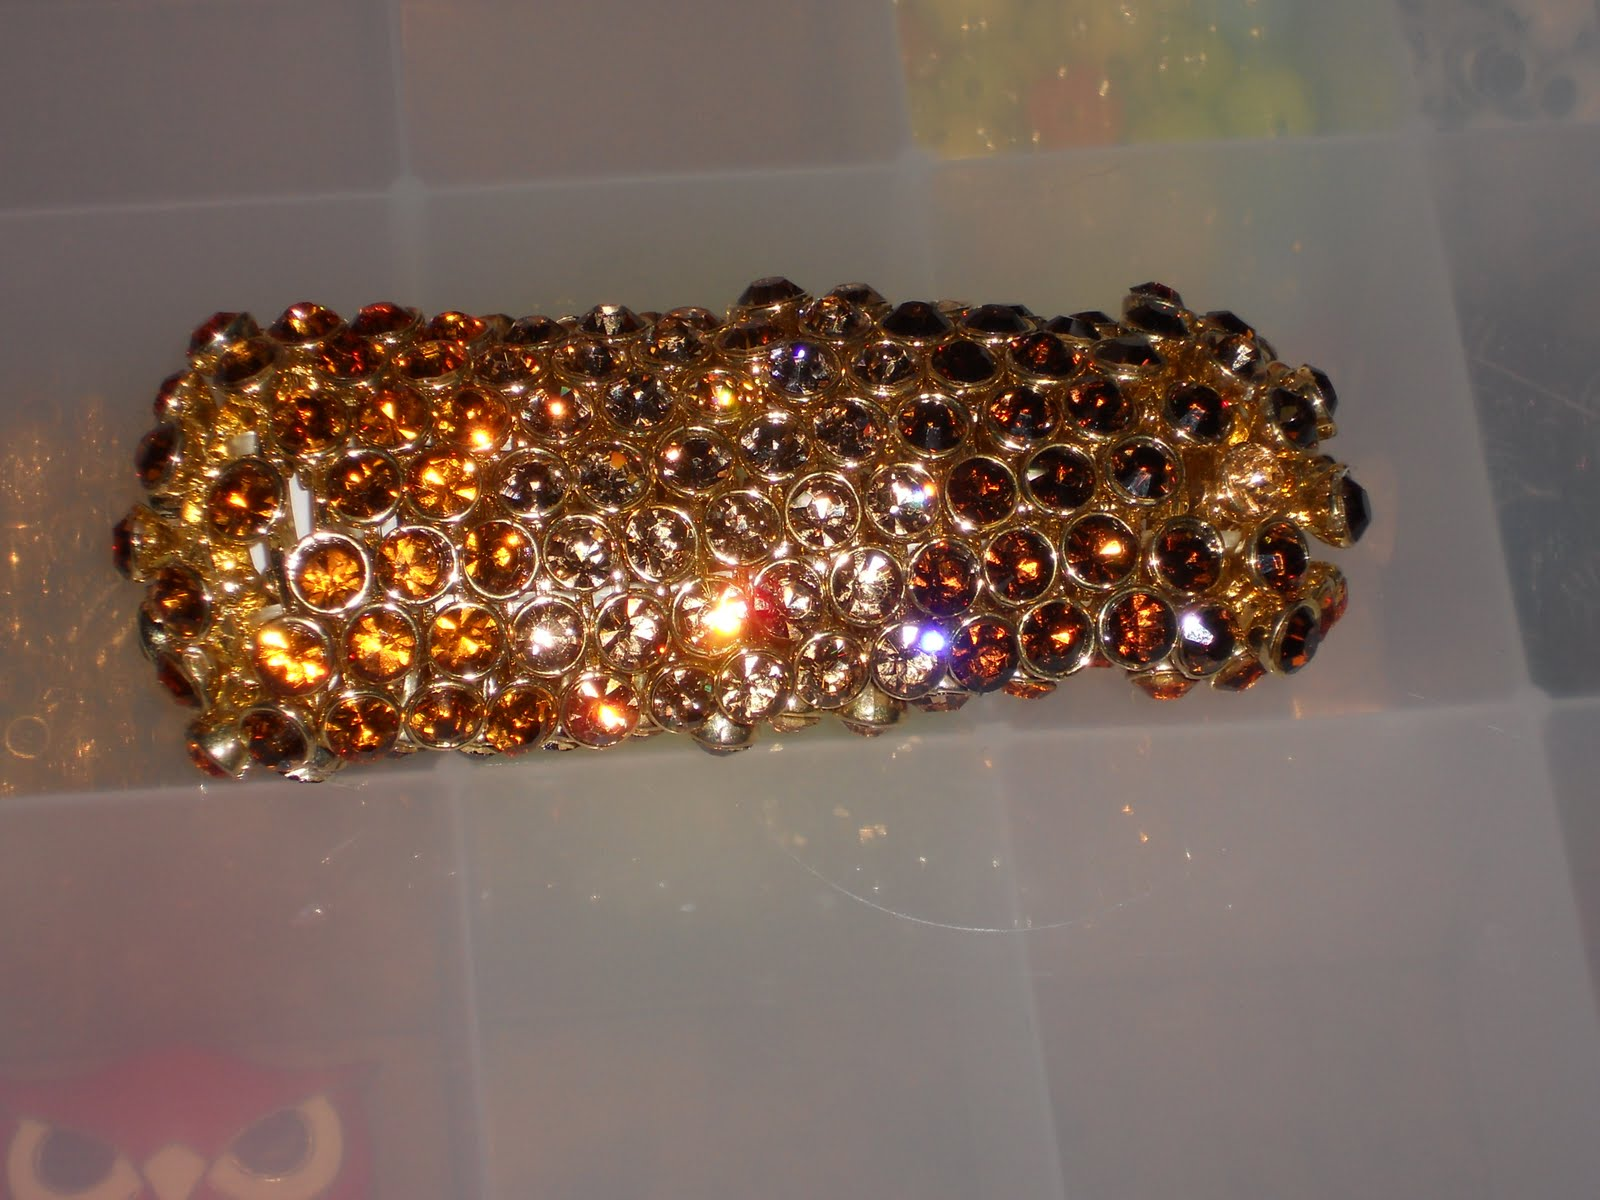 http://1.bp.blogspot.com/-Lct1mp7nhAQ/TbTieAbhTVI/AAAAAAAAAJU/cI-FyI883Qw/s1600/its+a+wrap+burlesque+bracelet.JPG